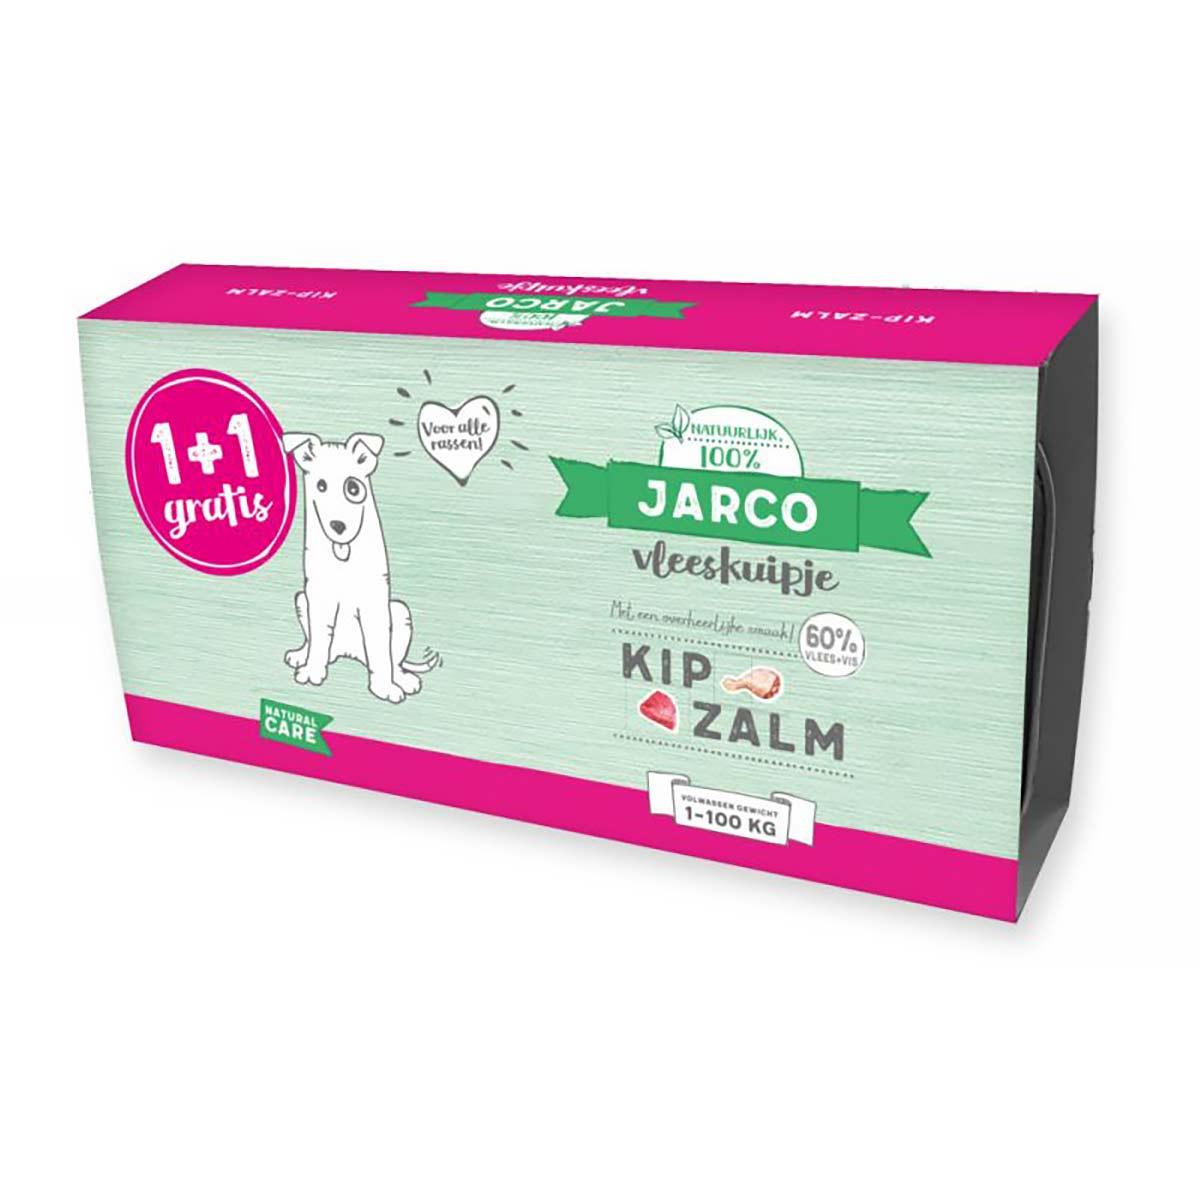 Jarco Dog Alu Kip-Zalm